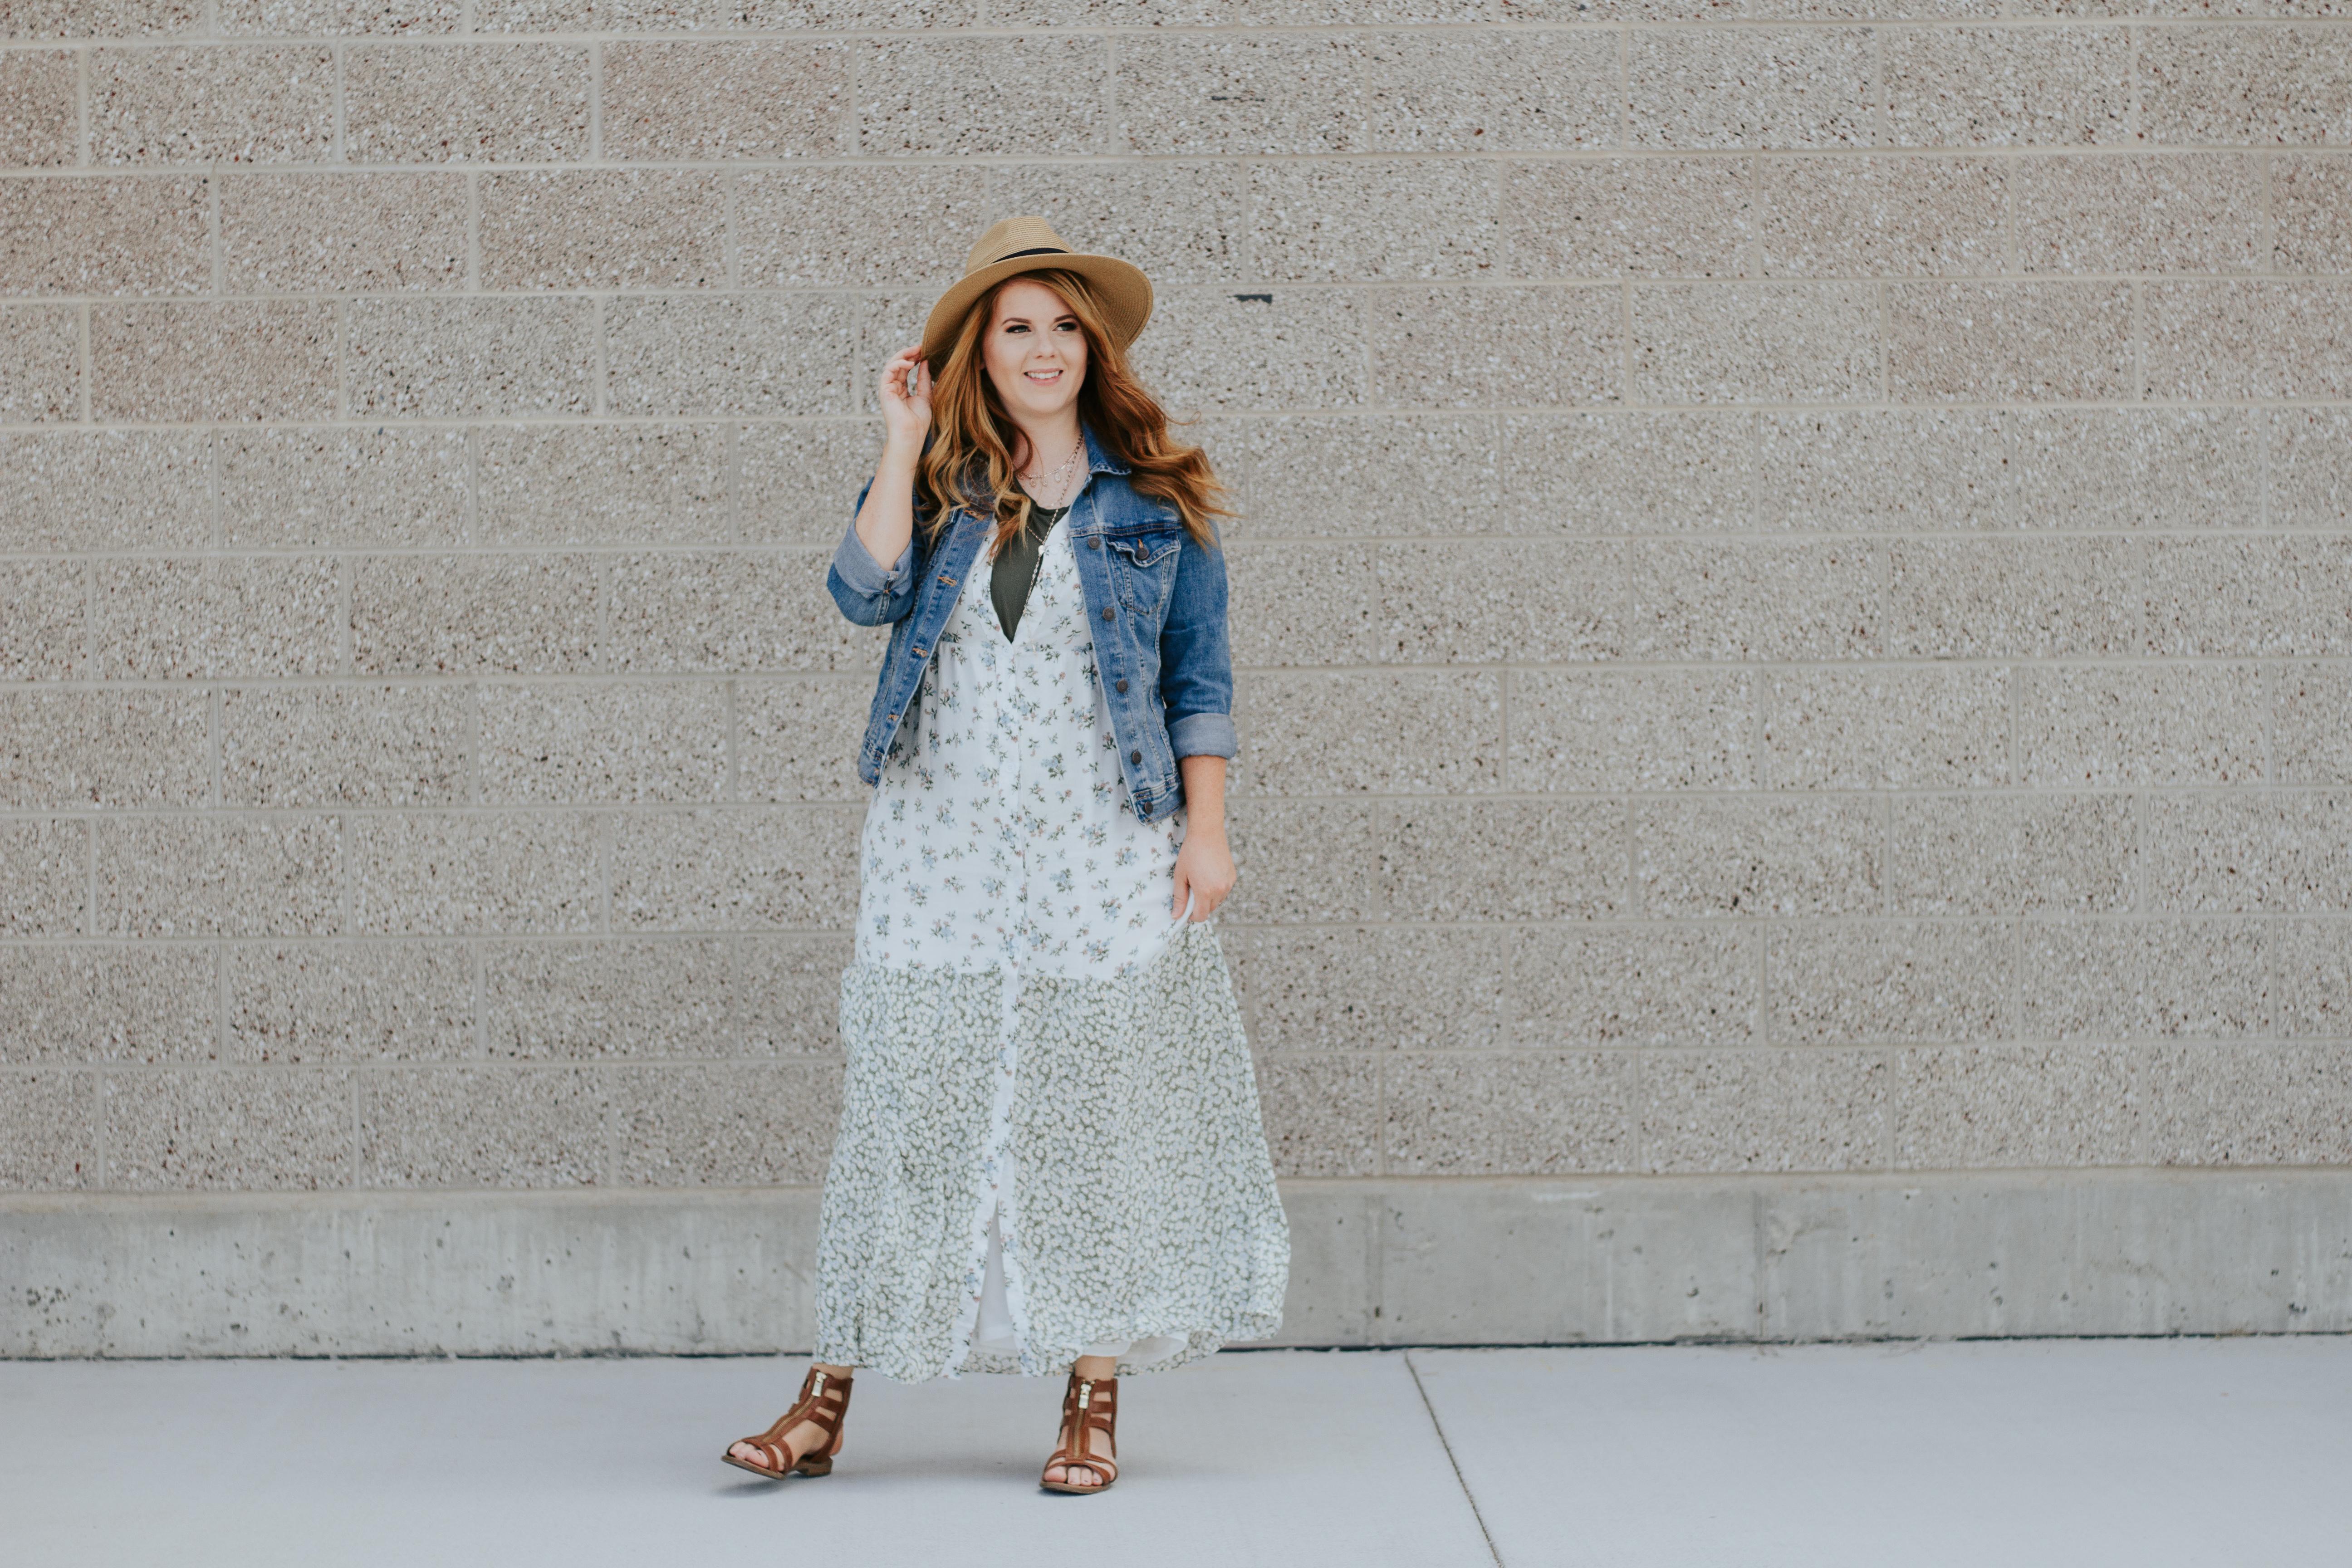 styling a dress three ways